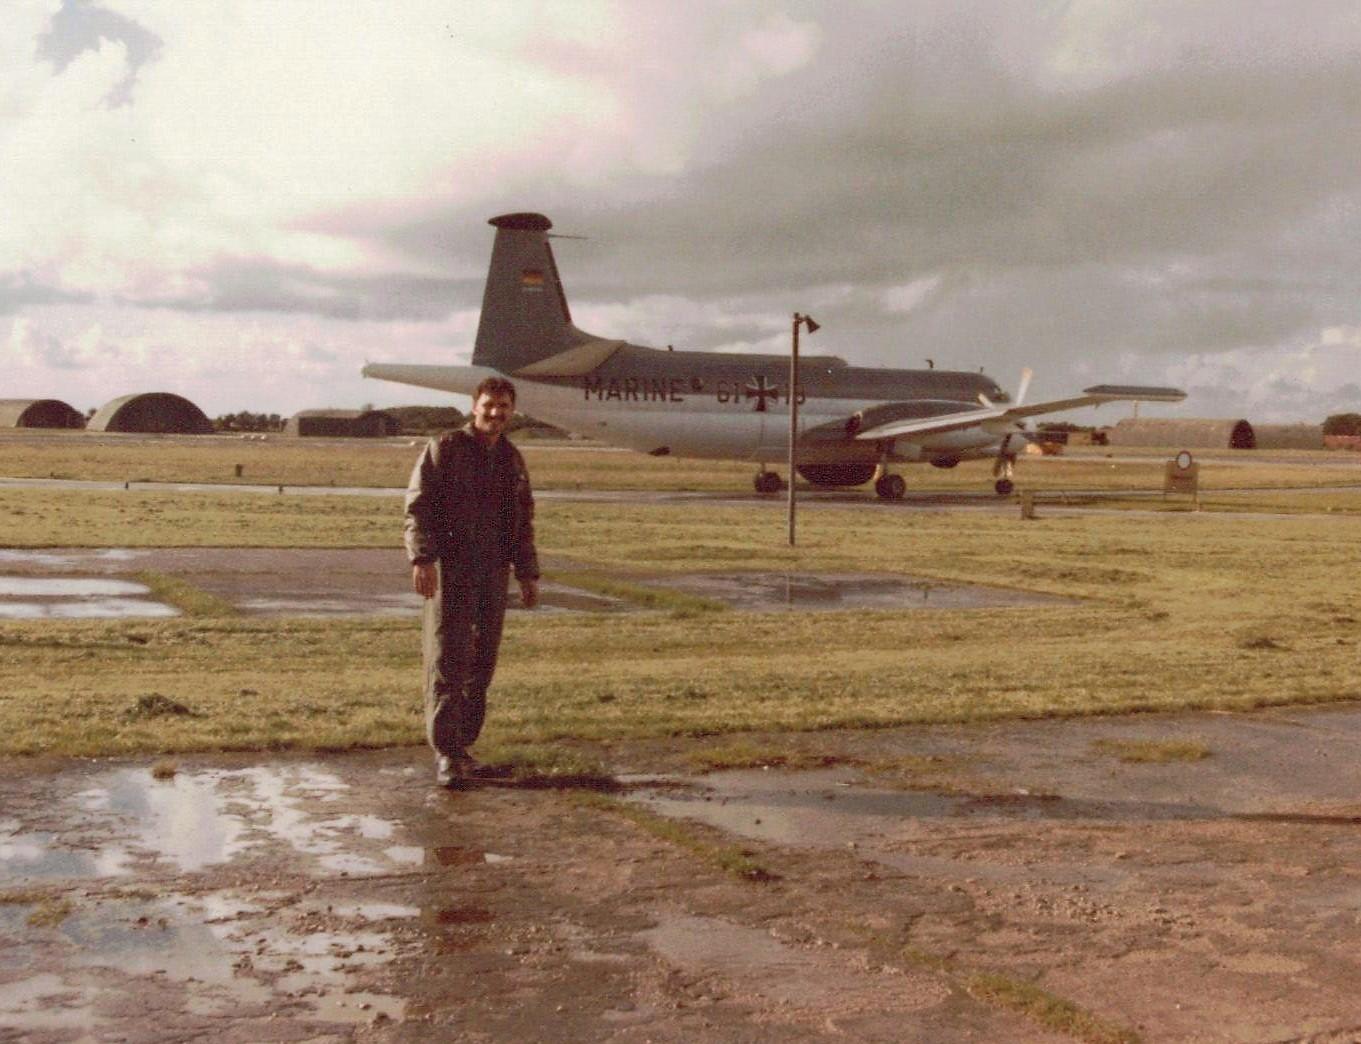 Lt Tzitzura Germany Deployment- Oct 1987